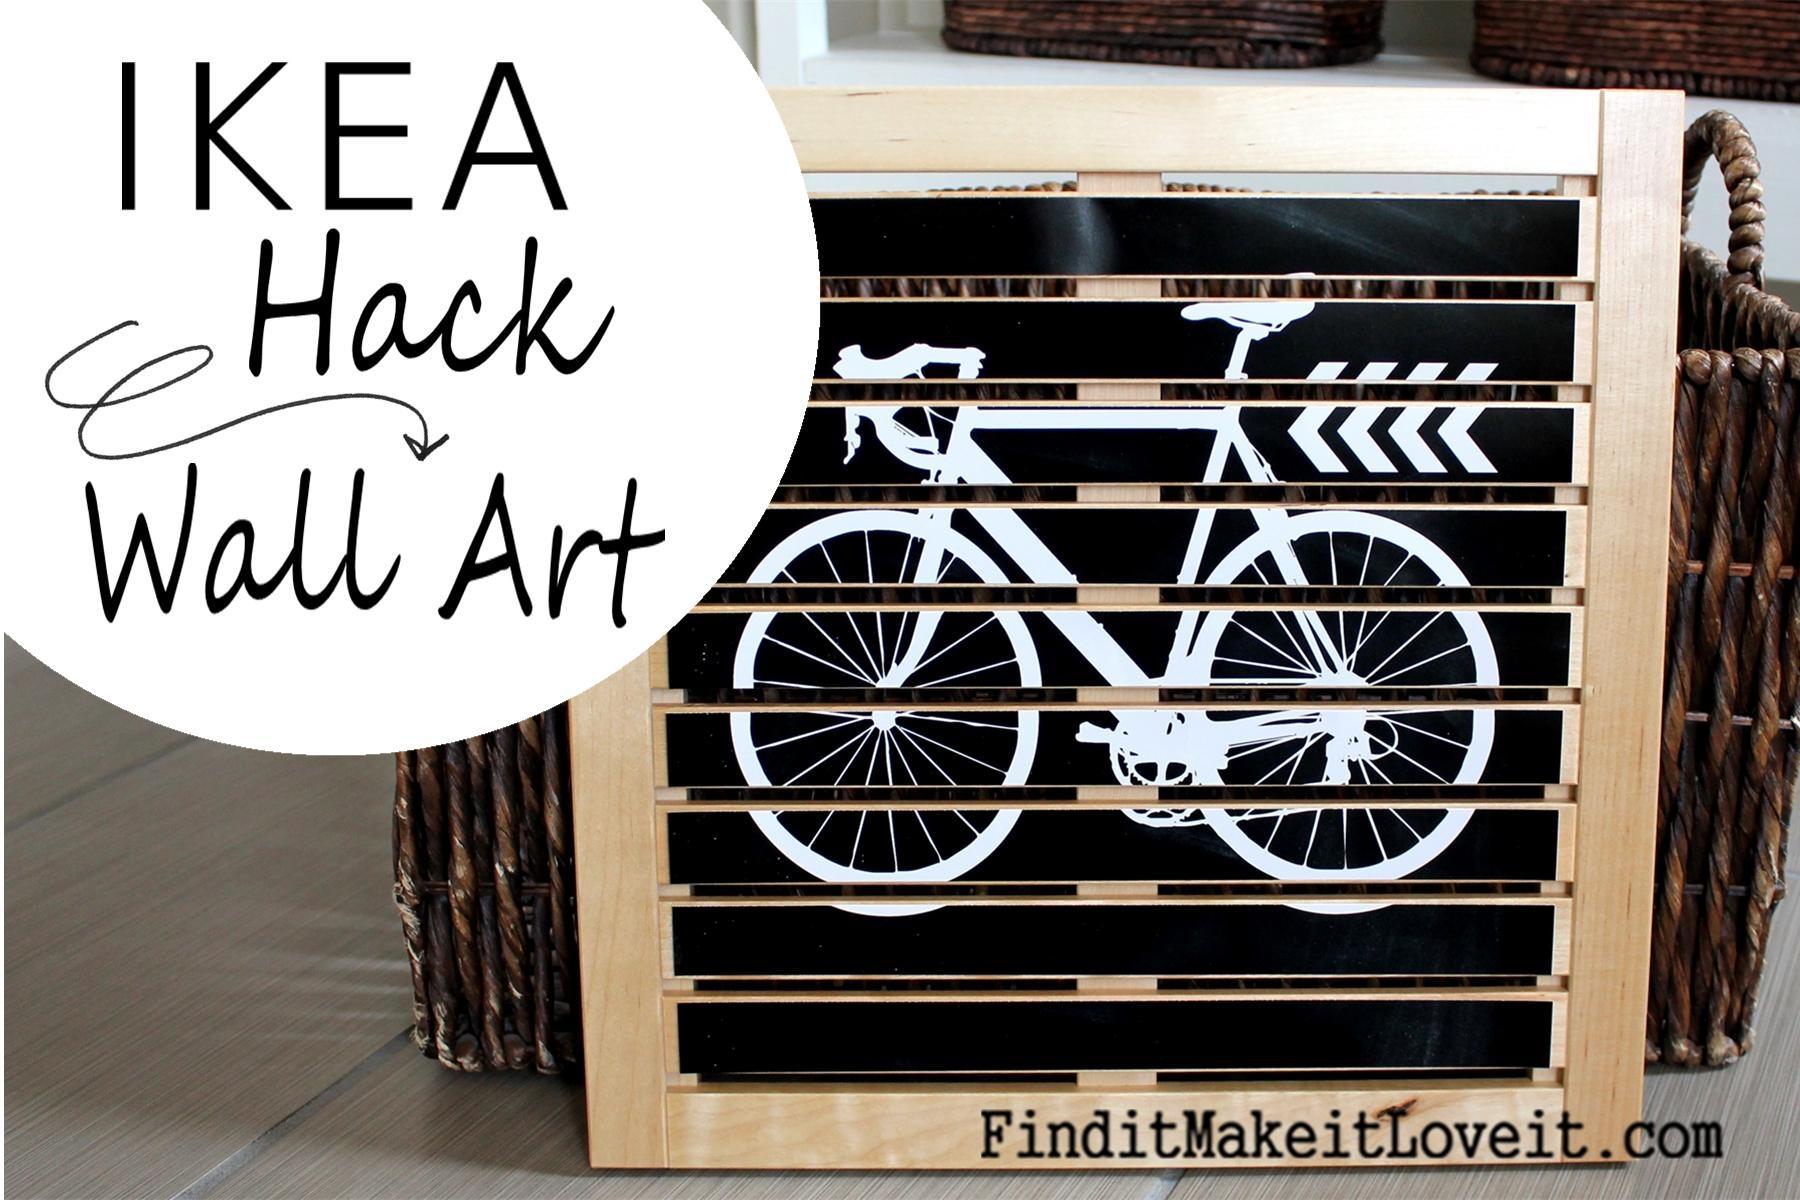 Ikea Wall Art | Roselawnlutheran With Regard To Ikea Giant Wall Art (Image 9 of 20)